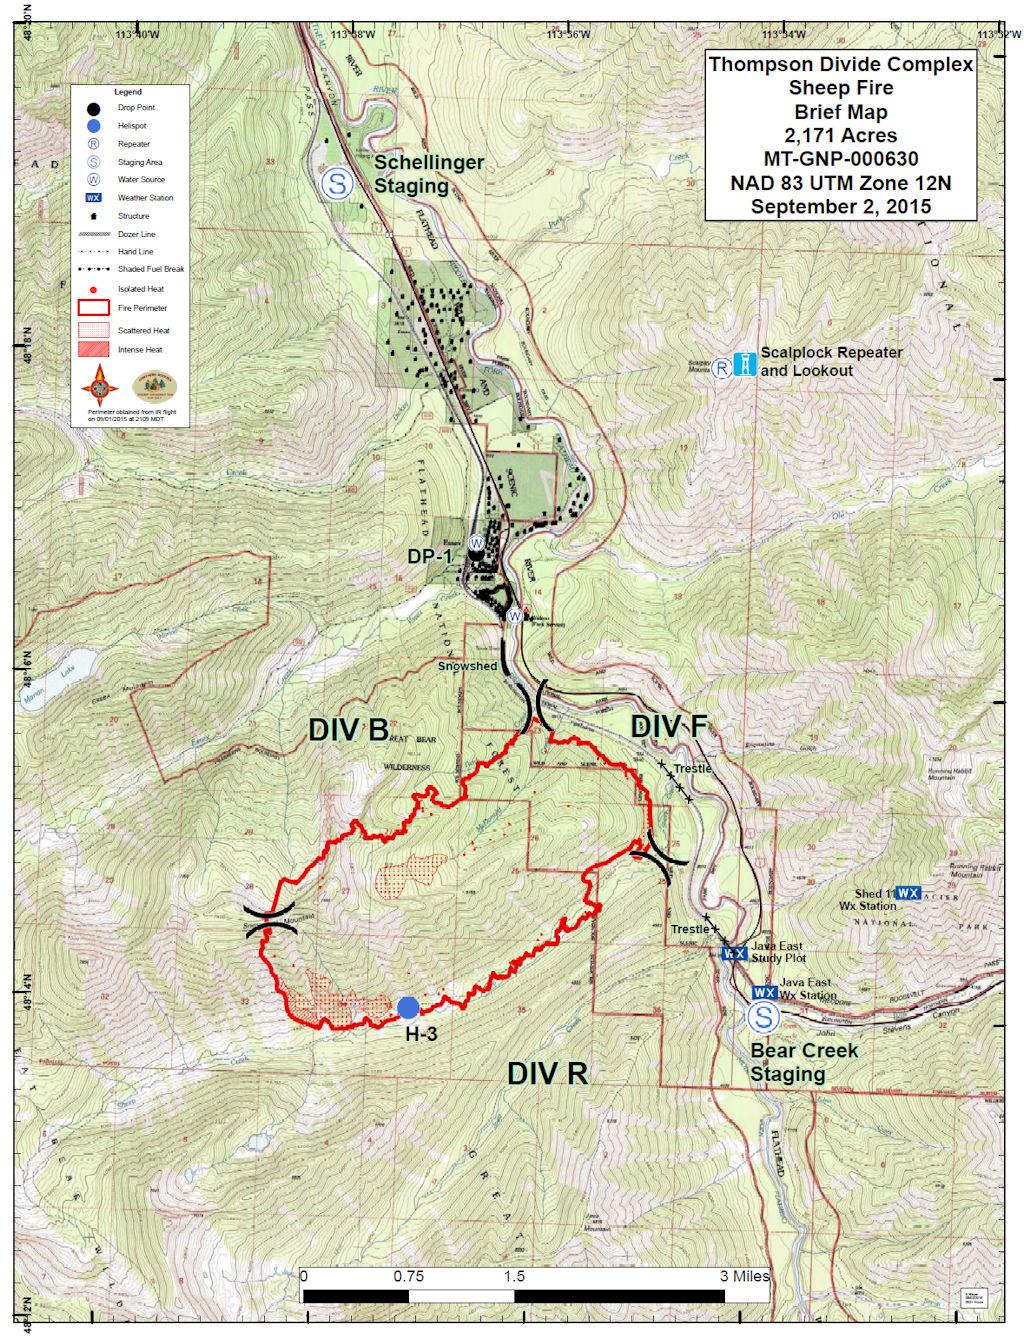 Sheep Fire Perimeter Map, Sep 2, 2015